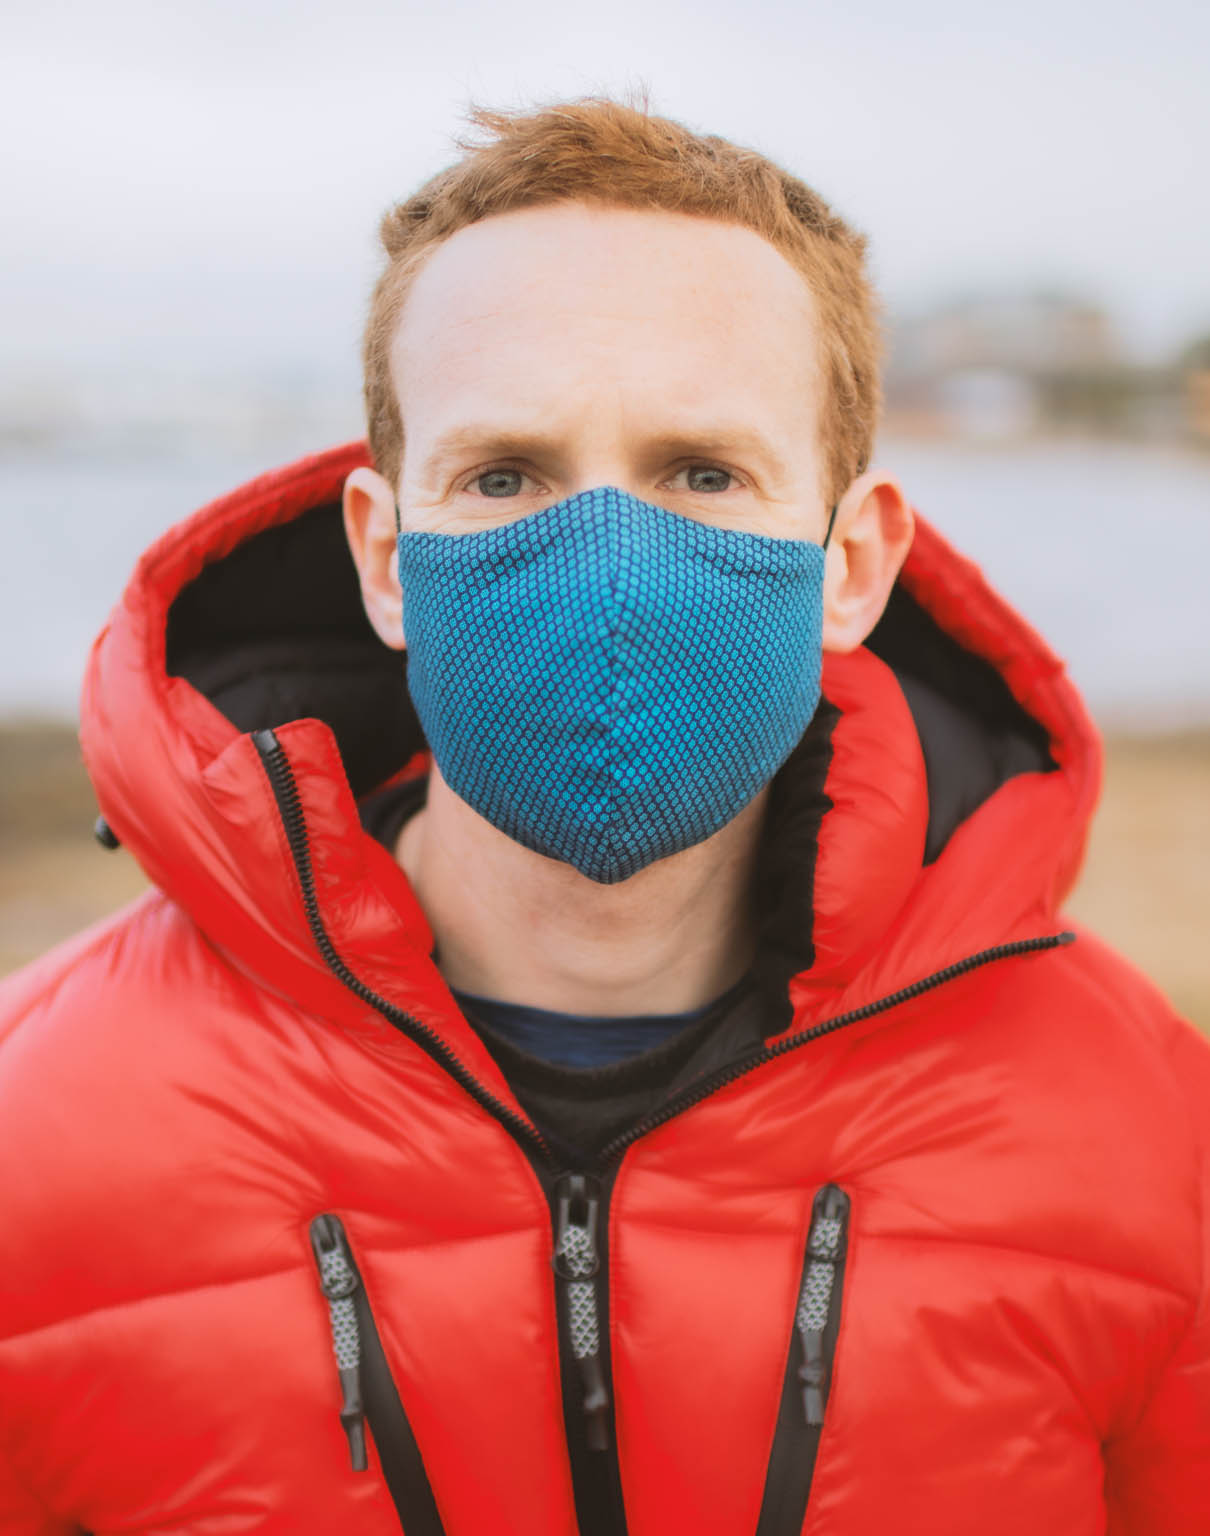 Stylish Teal Face Mask